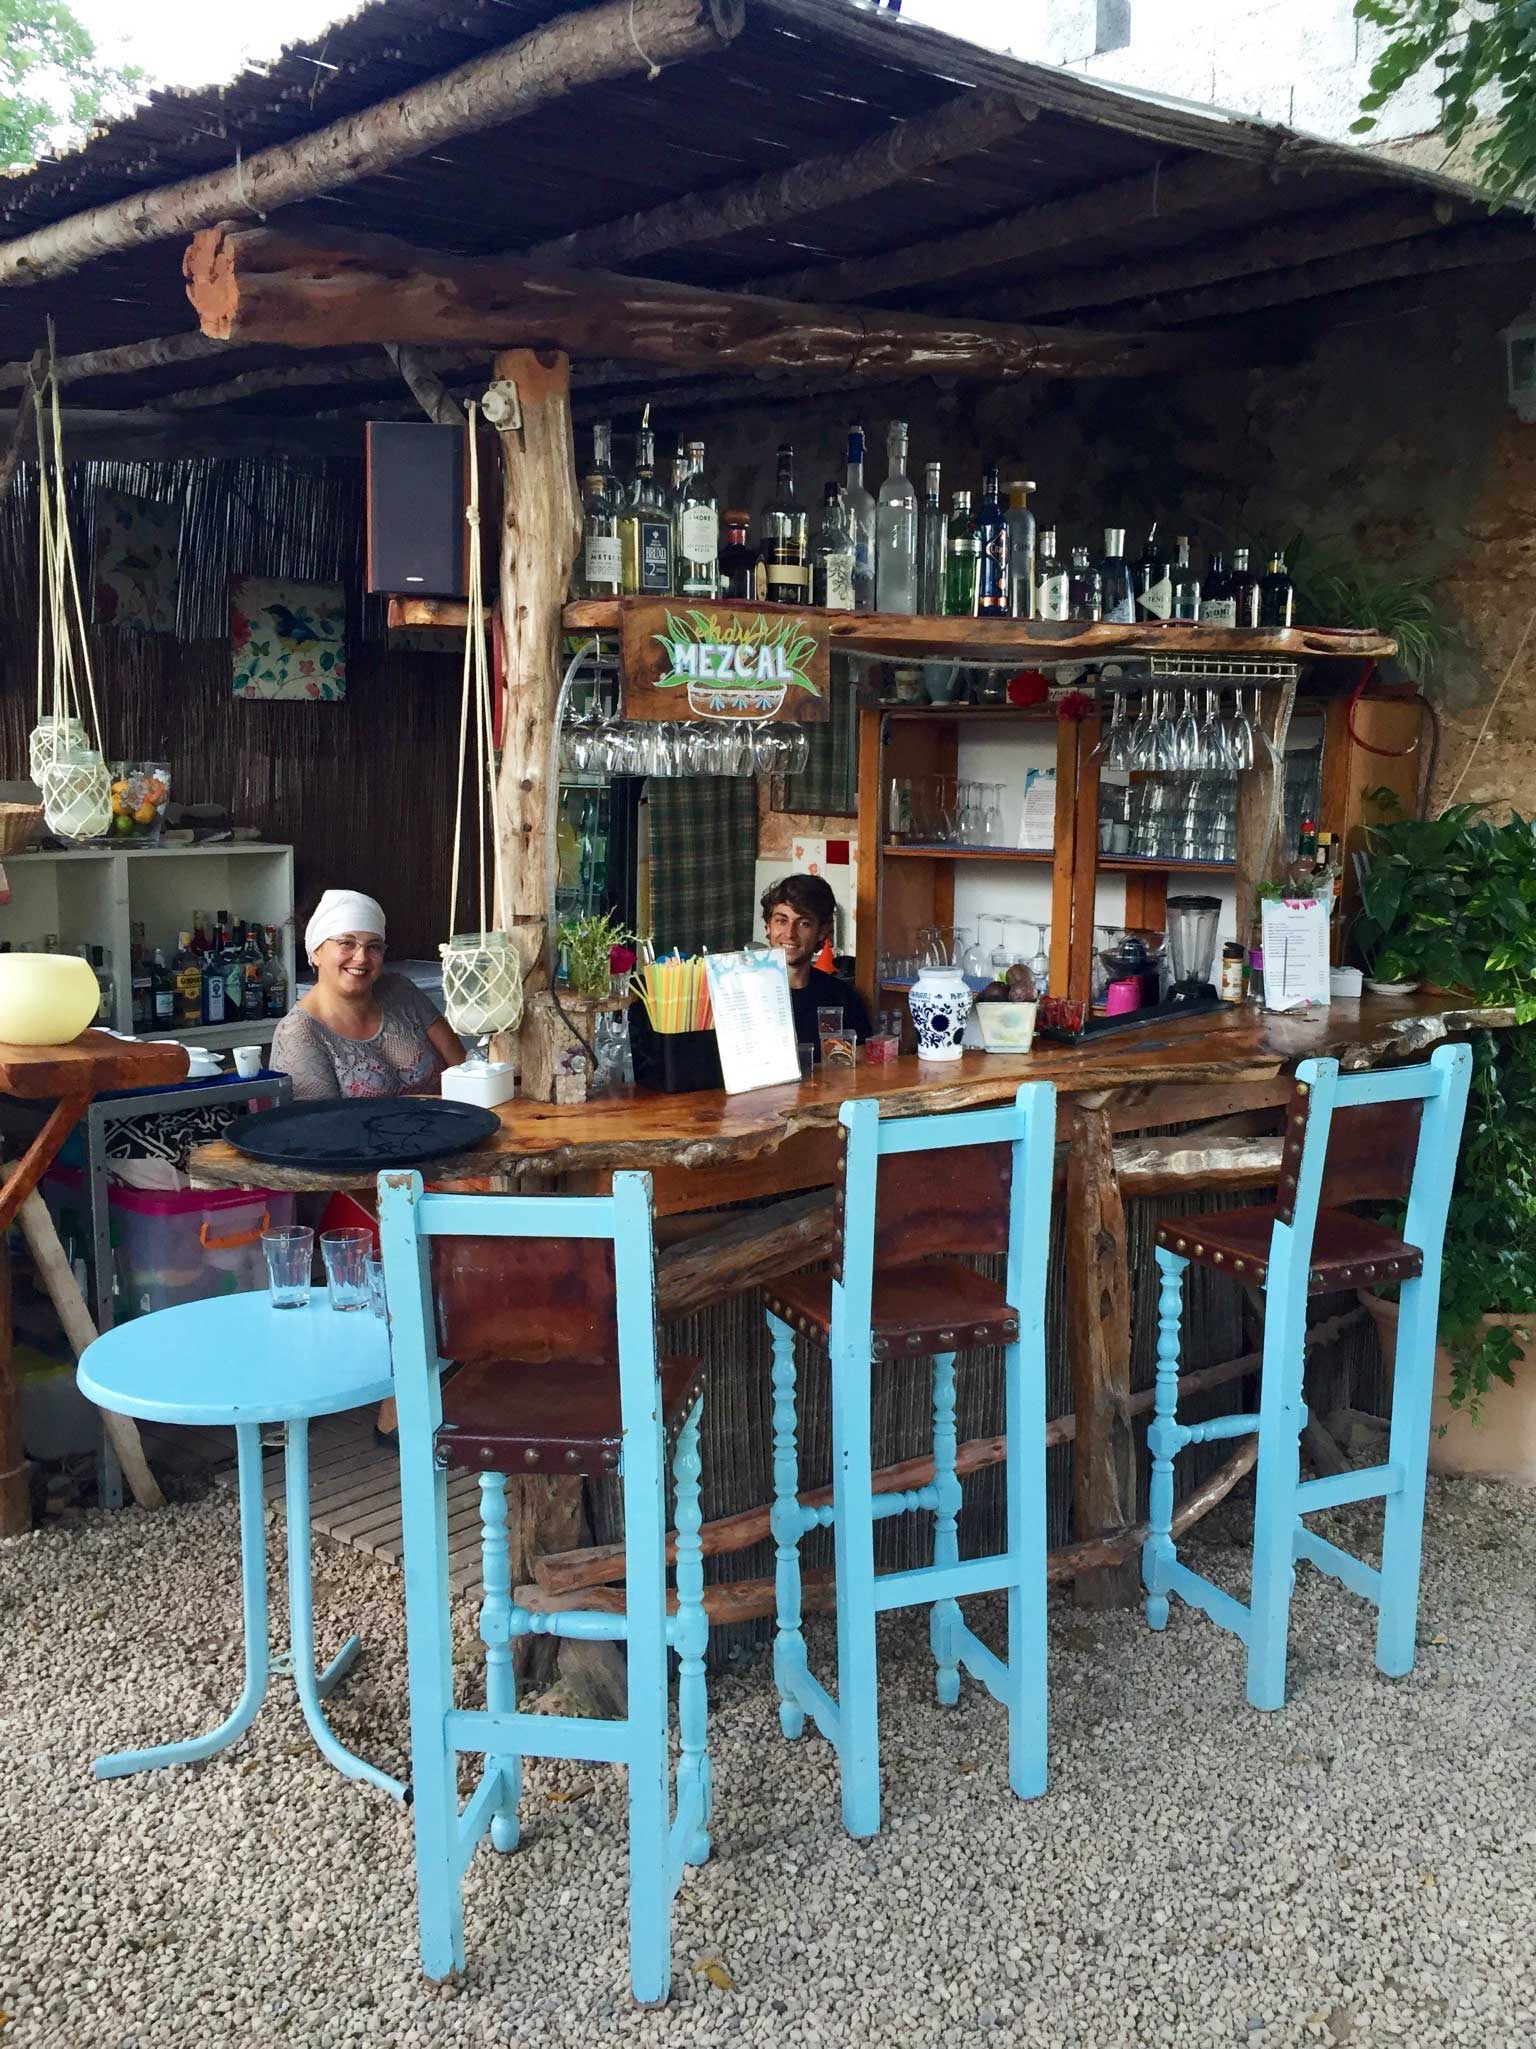 La Paloma family sitting at an outdoor wooden bar